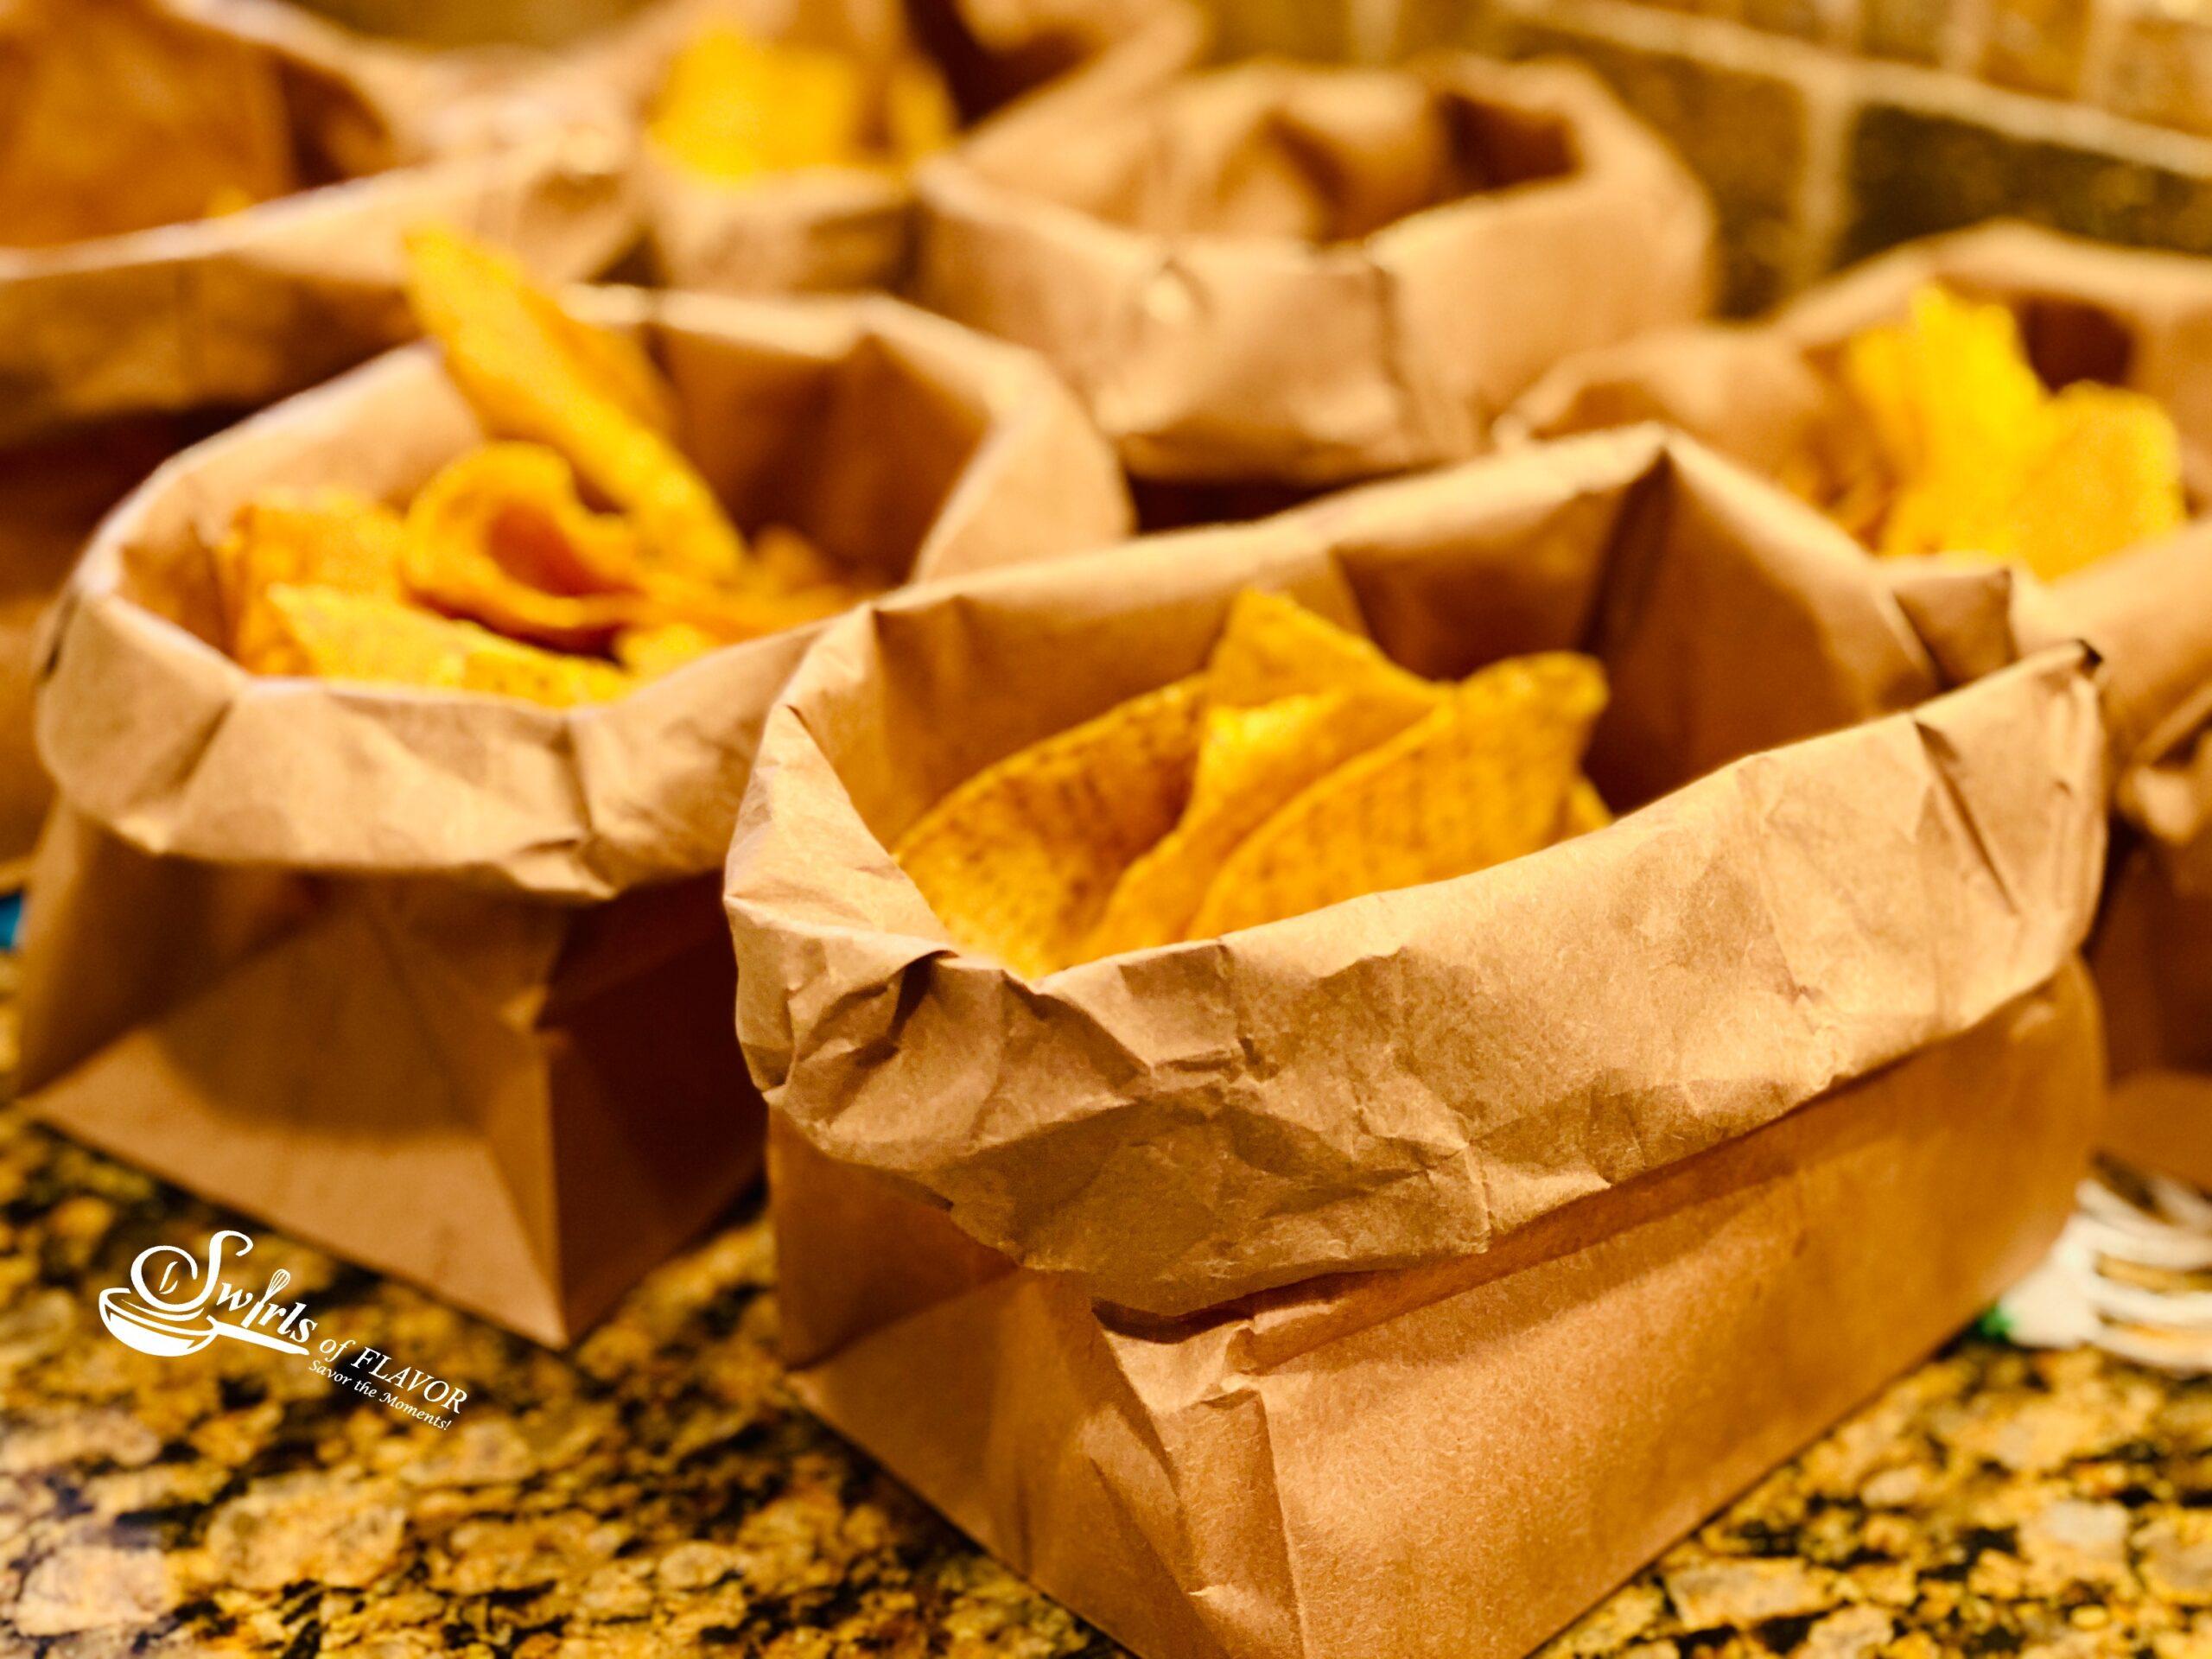 Tortilla Chips in brown paper bags